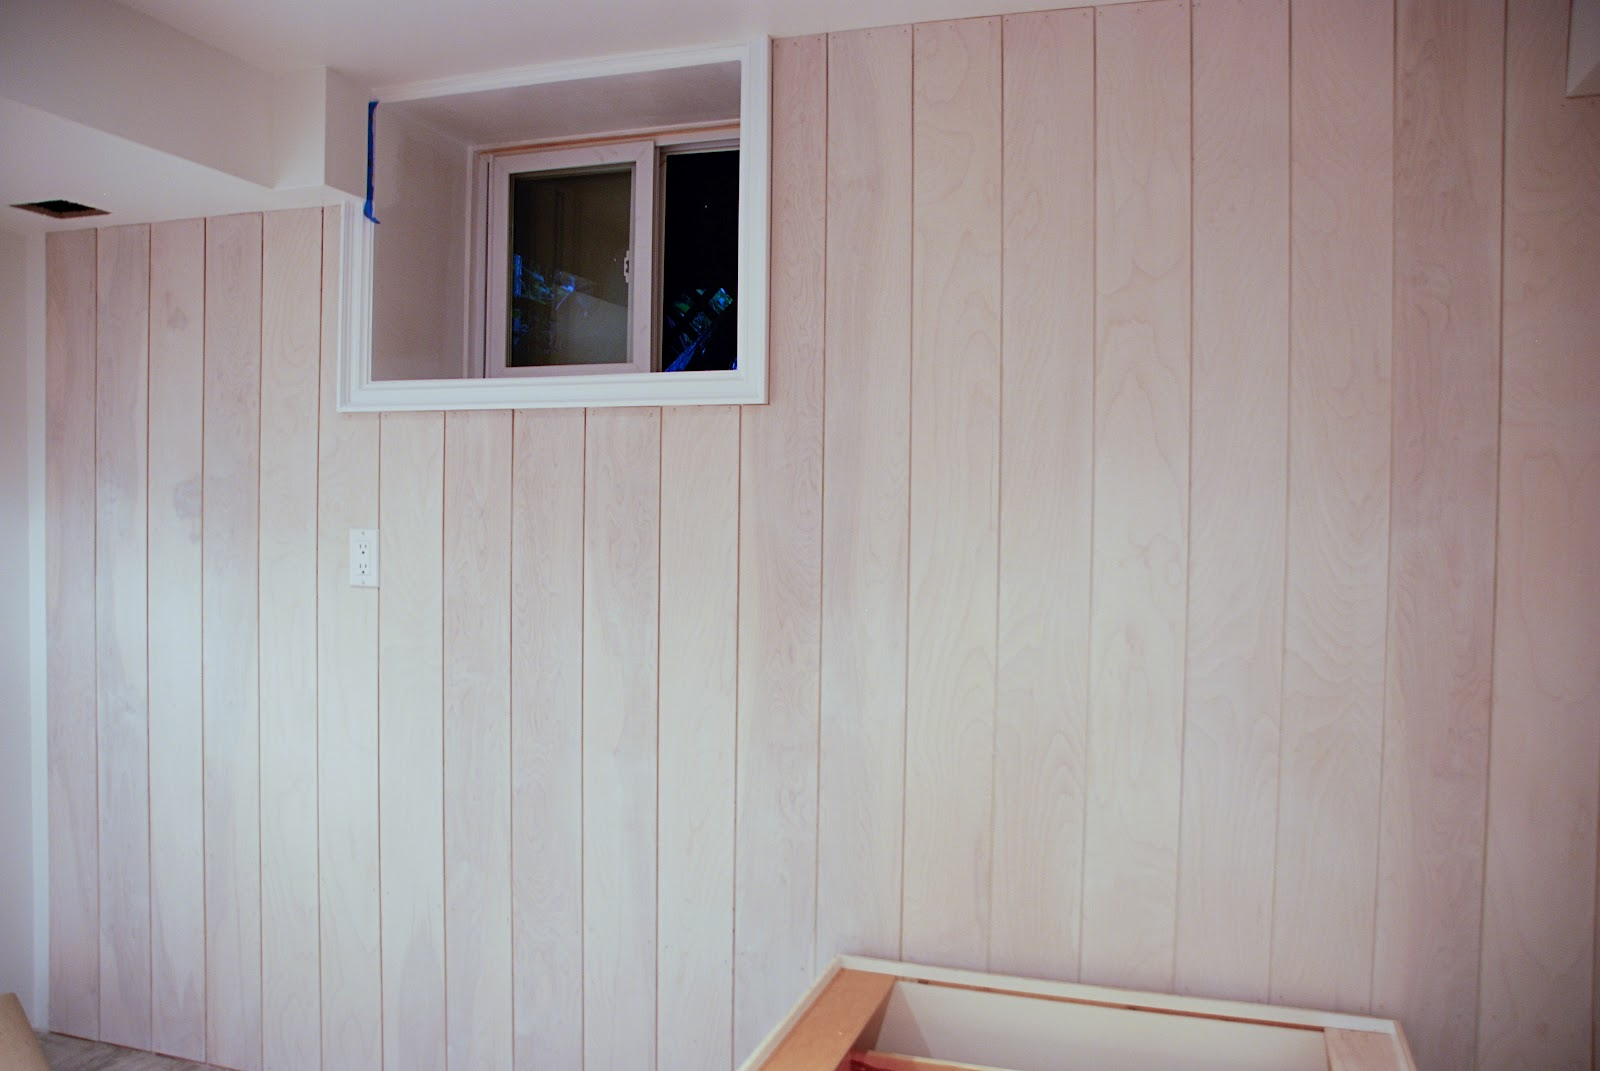 Plywood Plank Ceiling Part Ii Diy Whitewashed Plank Walls Rambling Renovators